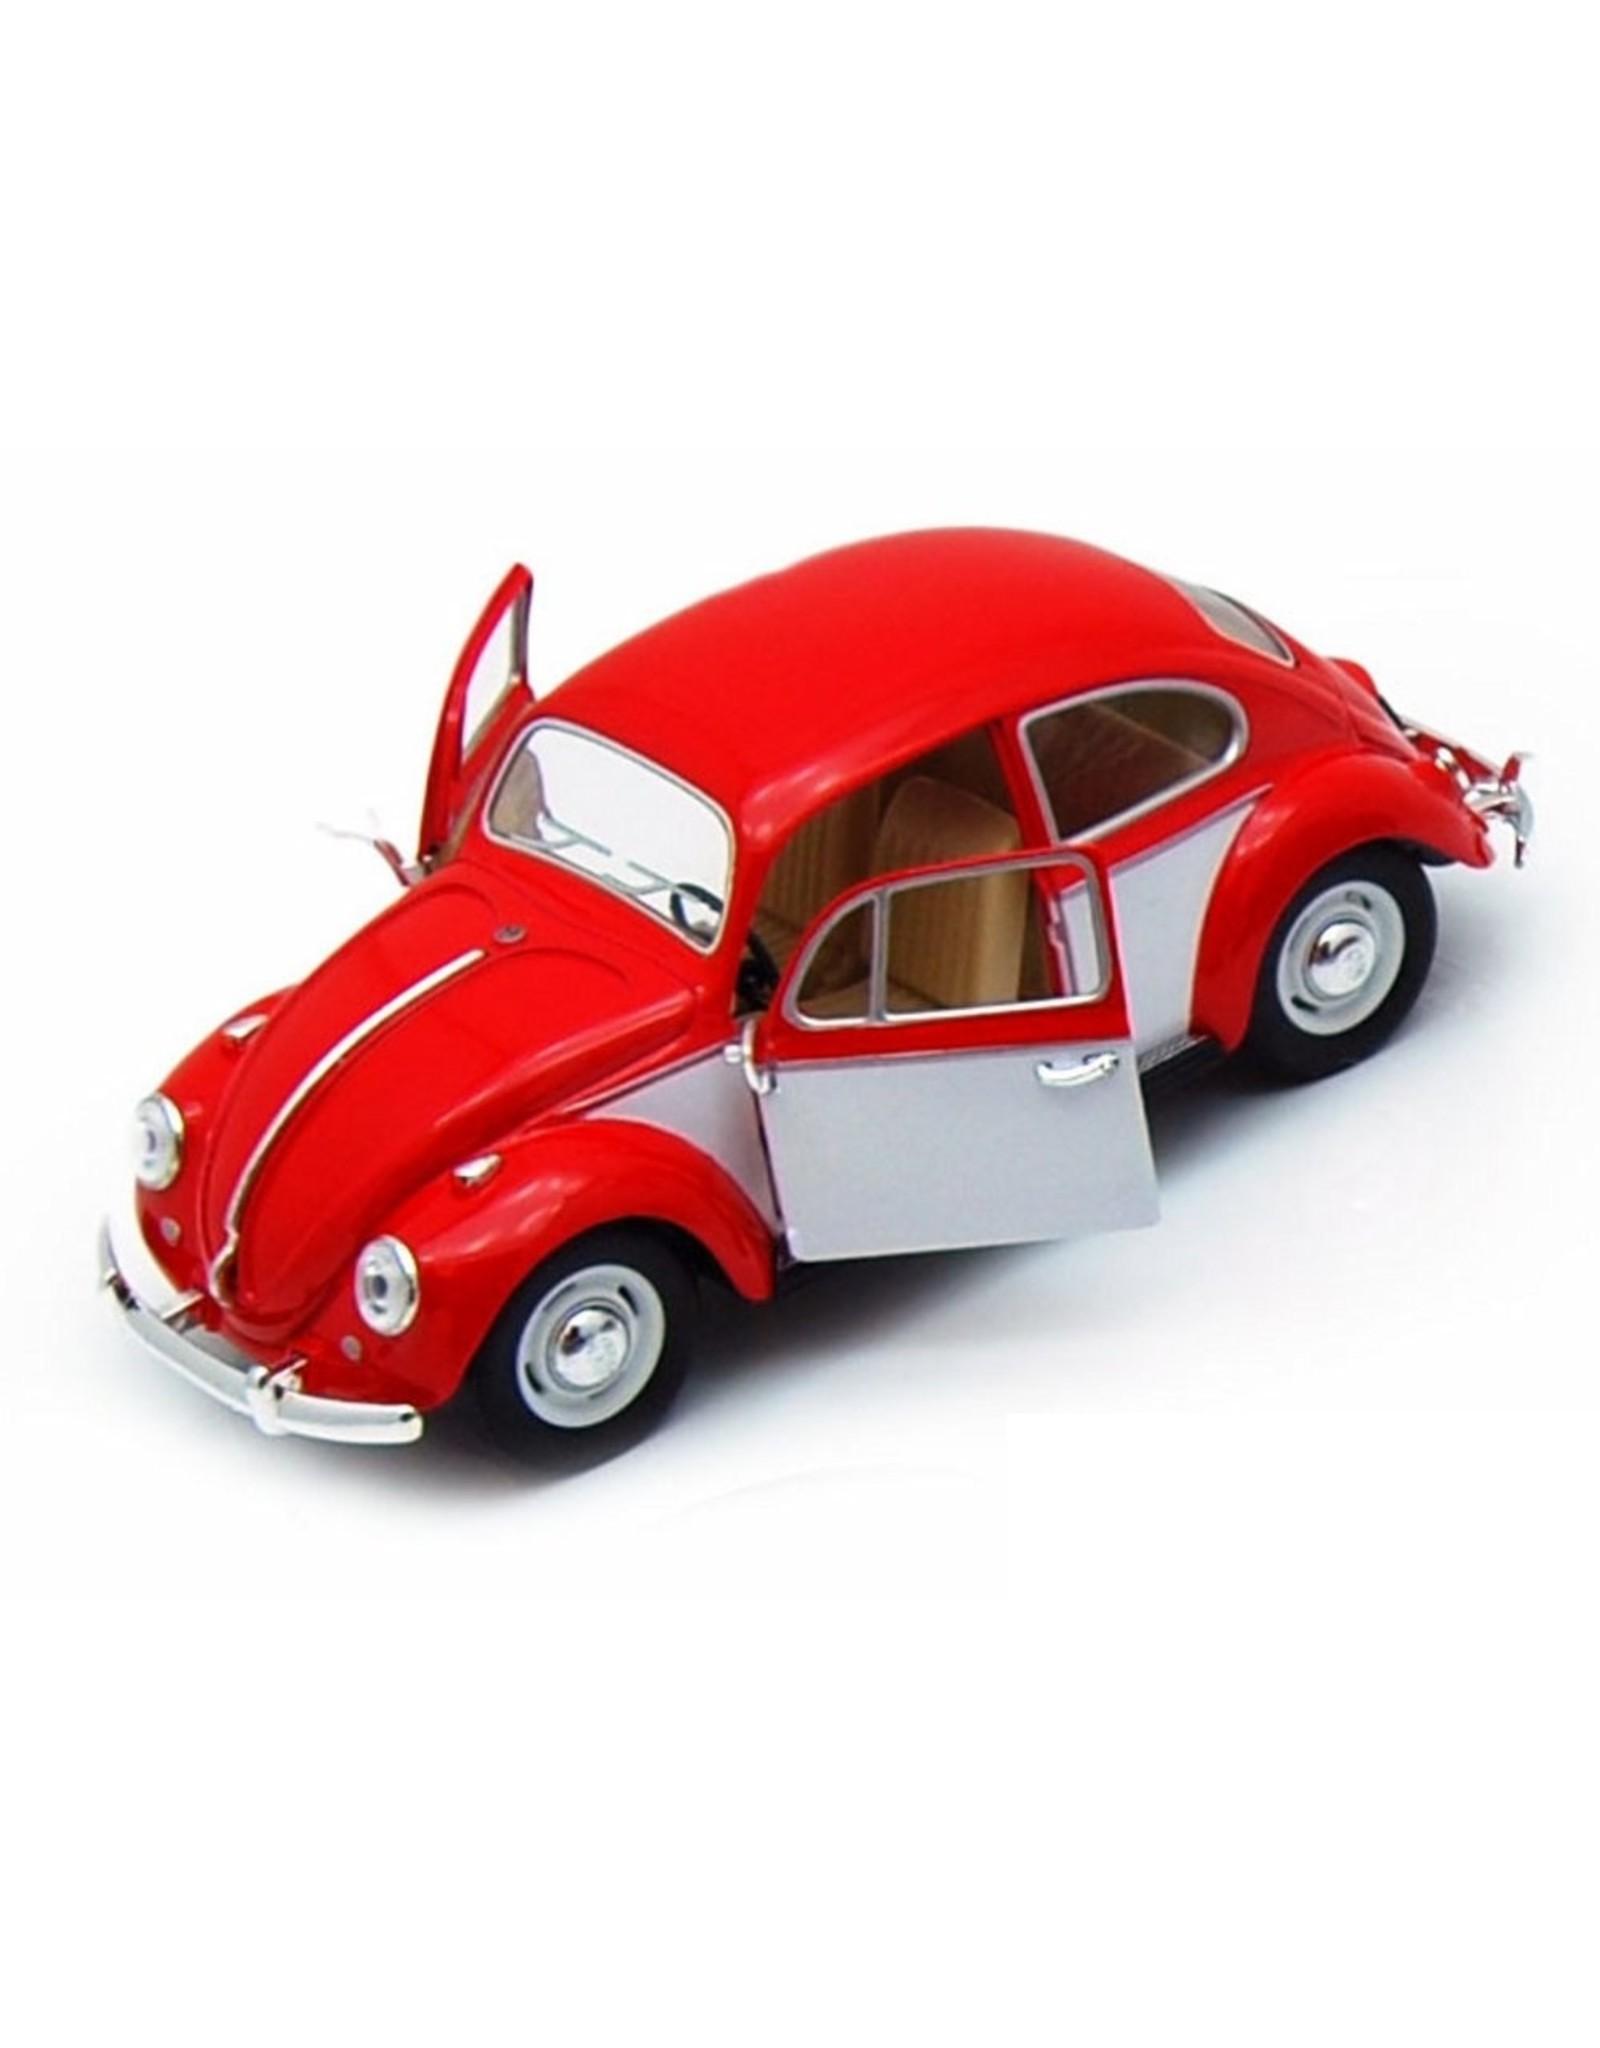 Volkswagen Beetle (1:32) - red / white